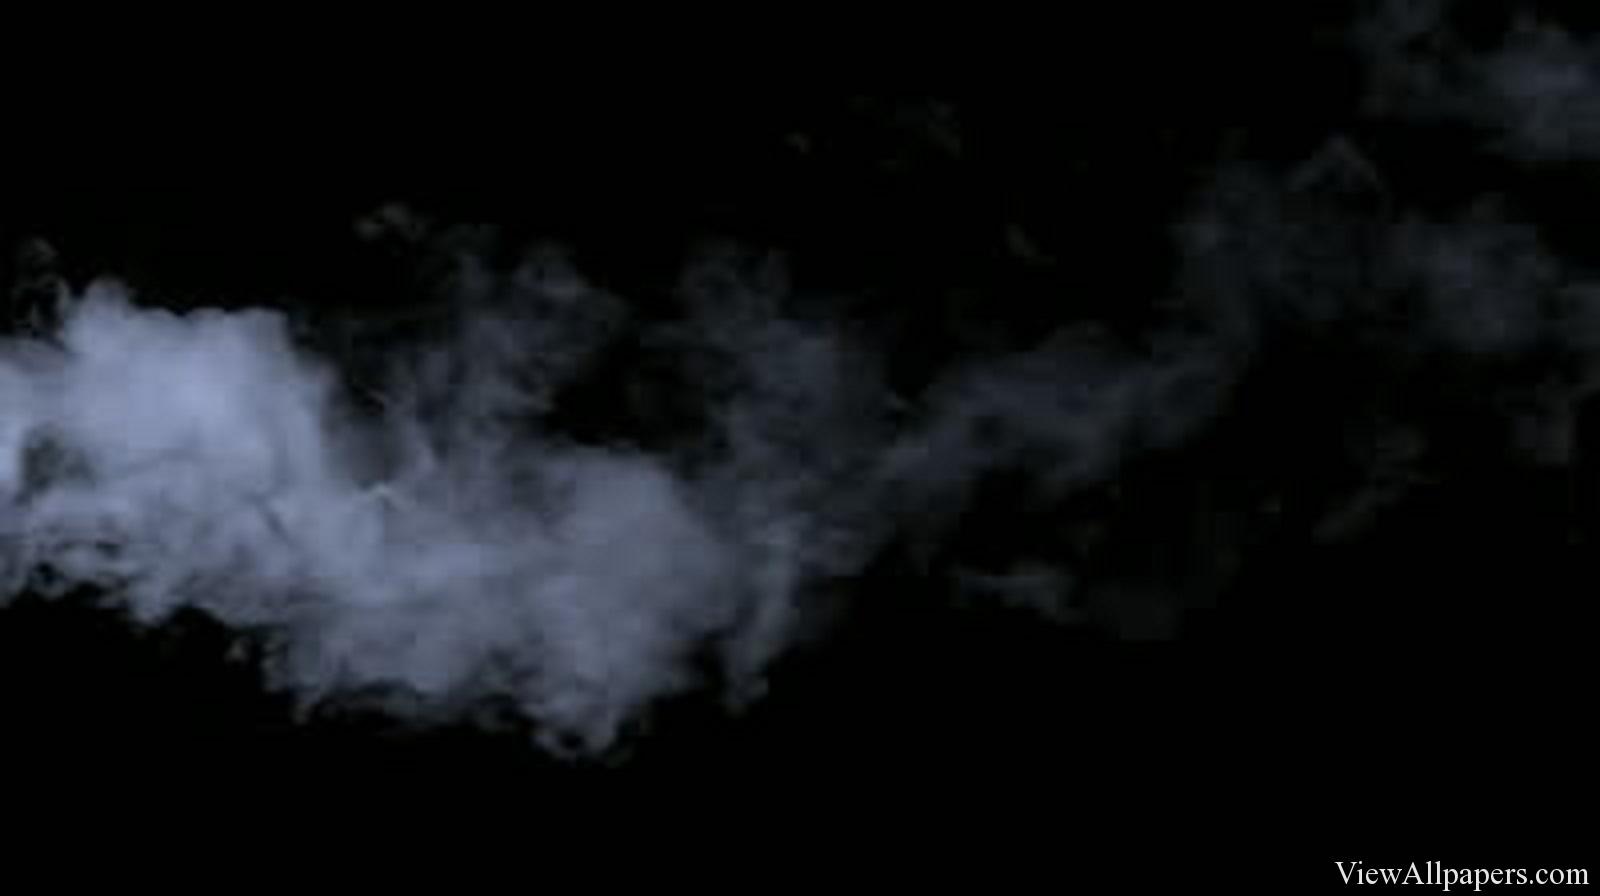 Smoke On Black High Resolution Wallpaper Download Smoke 1600x896 Download Hd Wallpaper Wallpapertip